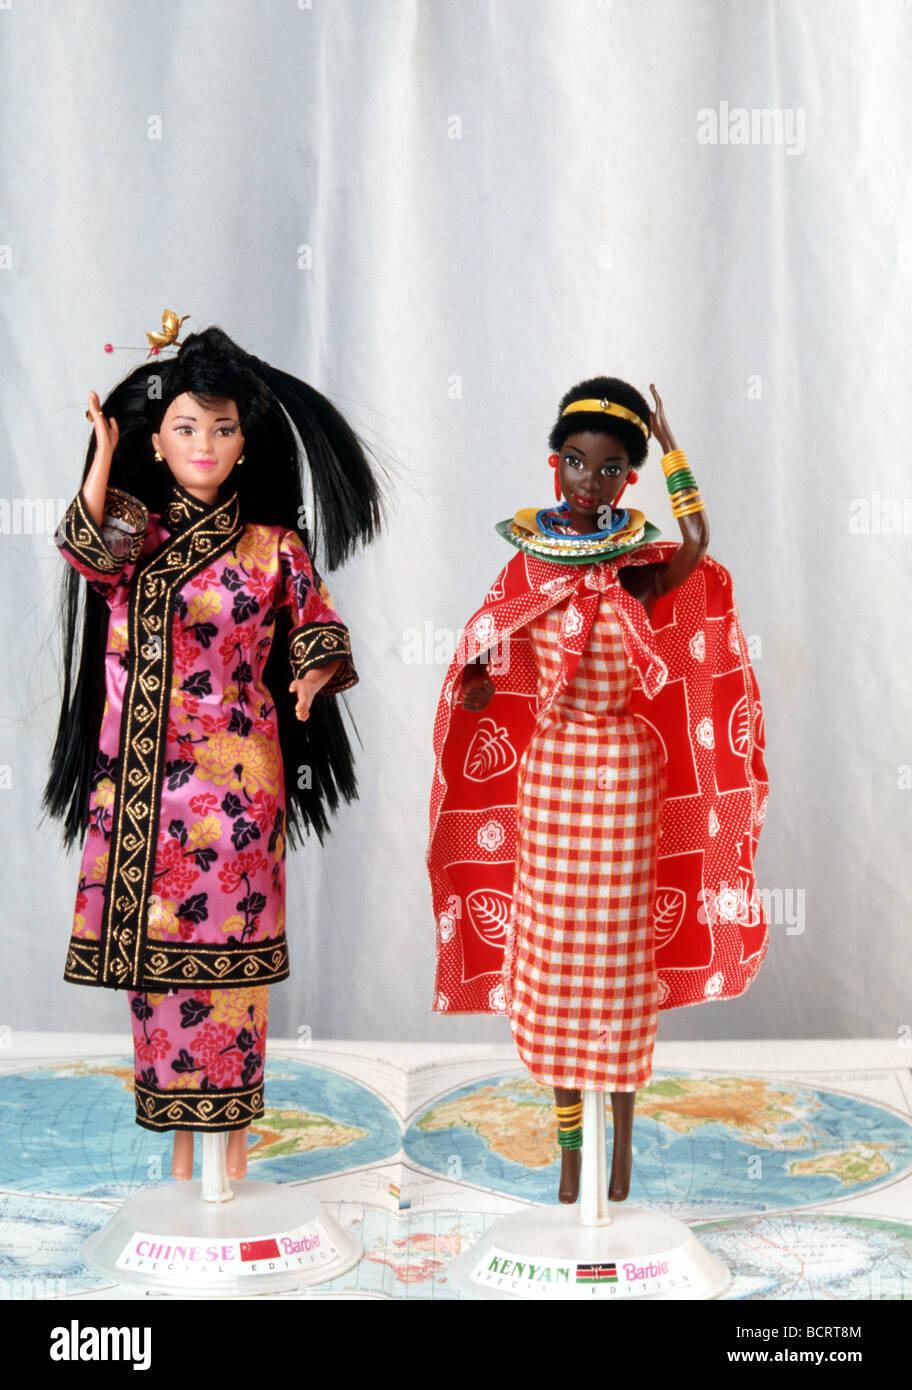 international barbie